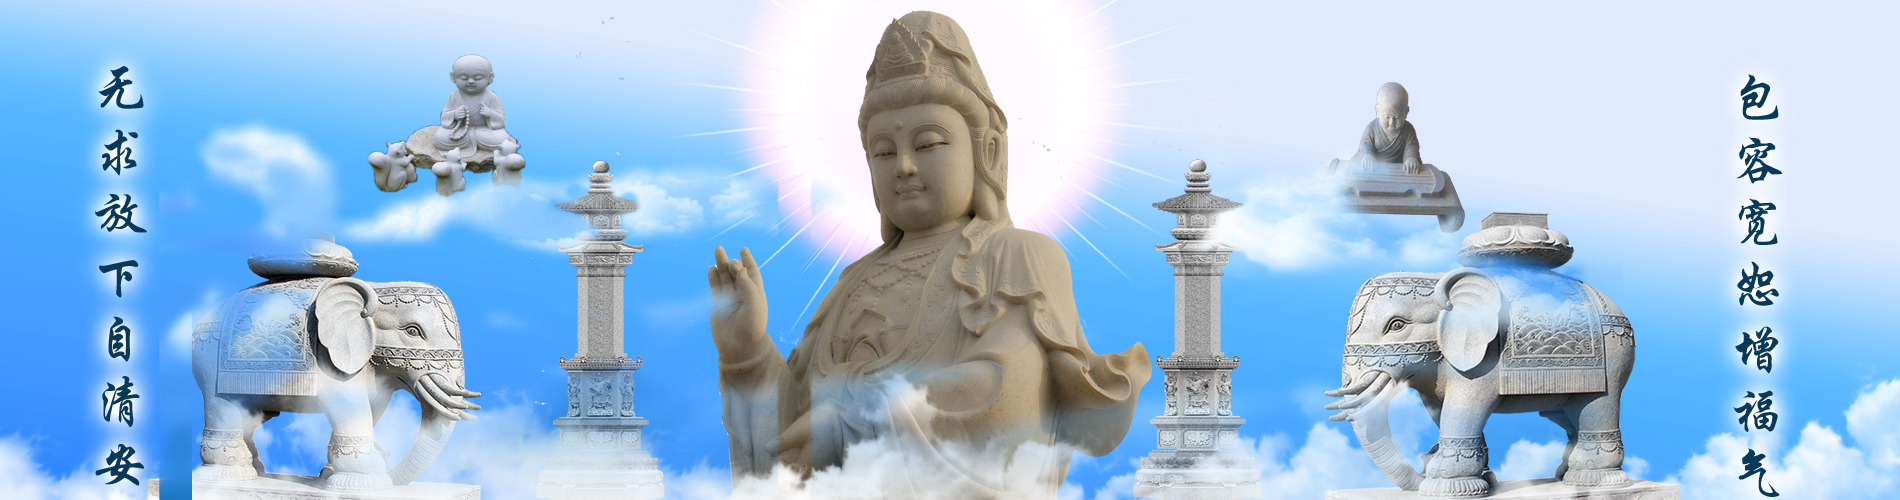 關(guan)于(yu)我們_石雕(diao)廠簡介